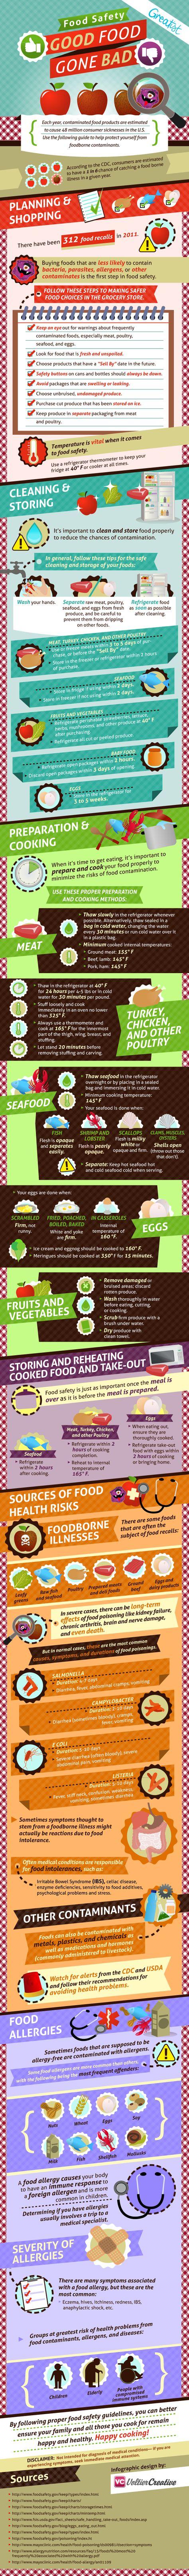 medium resolution of 170 FACS - Food Safety ideas   food safety